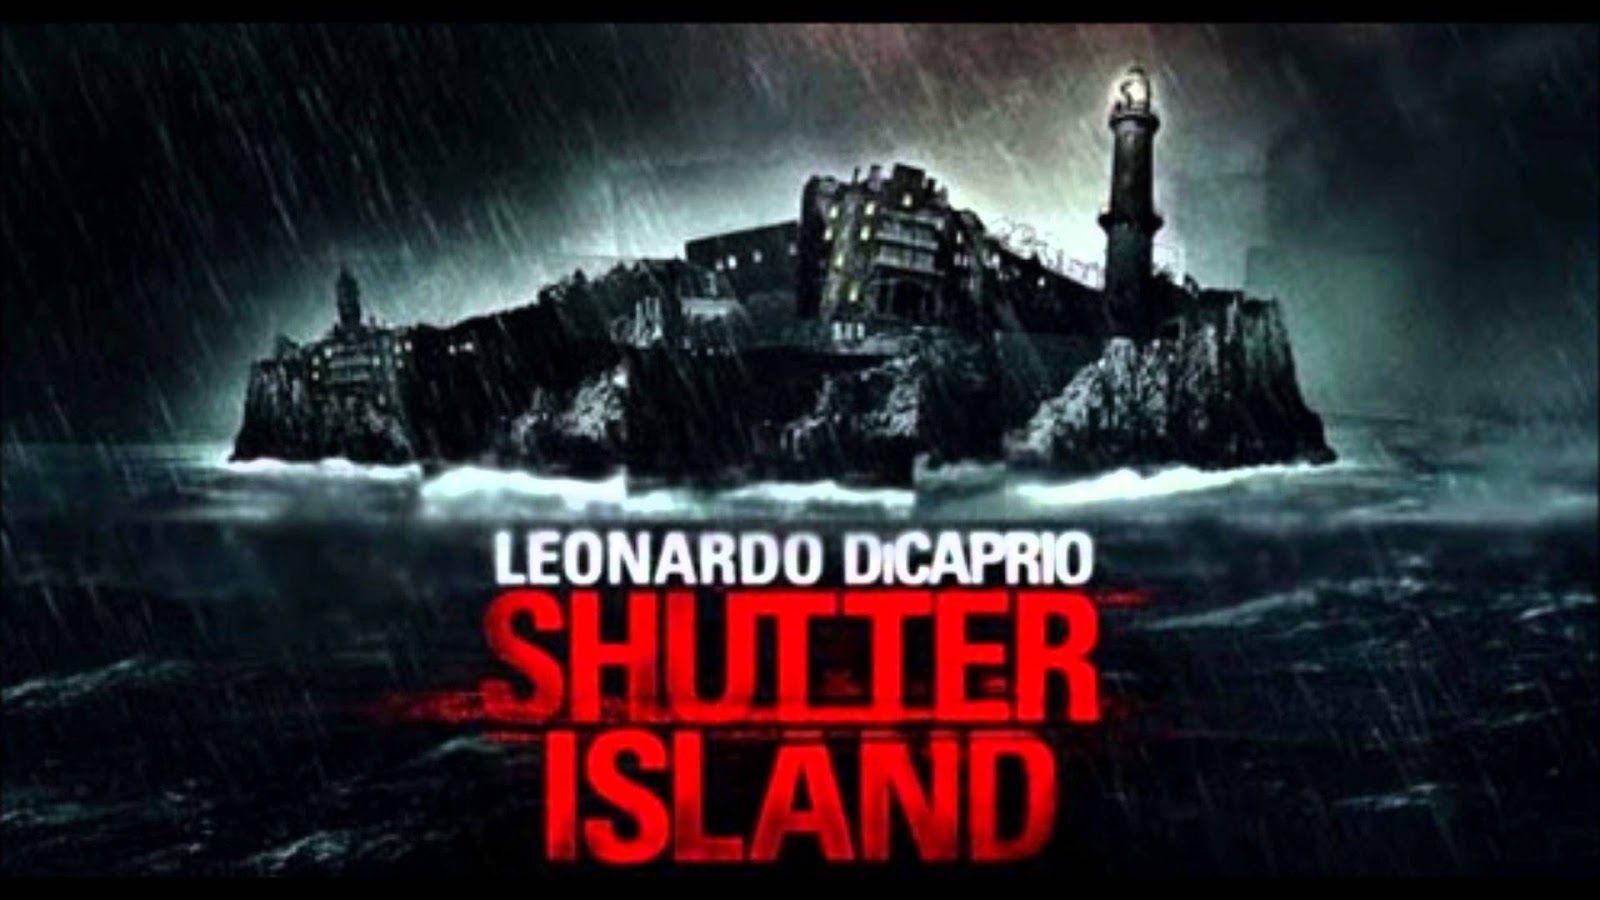 Shutter Island Titulada La Isla Siniestra En Hispanoamerica Es Una Pelicula De Suspense De 20 Shutter Island Leonardo Dicaprio Shutter Island Martin Scorsese